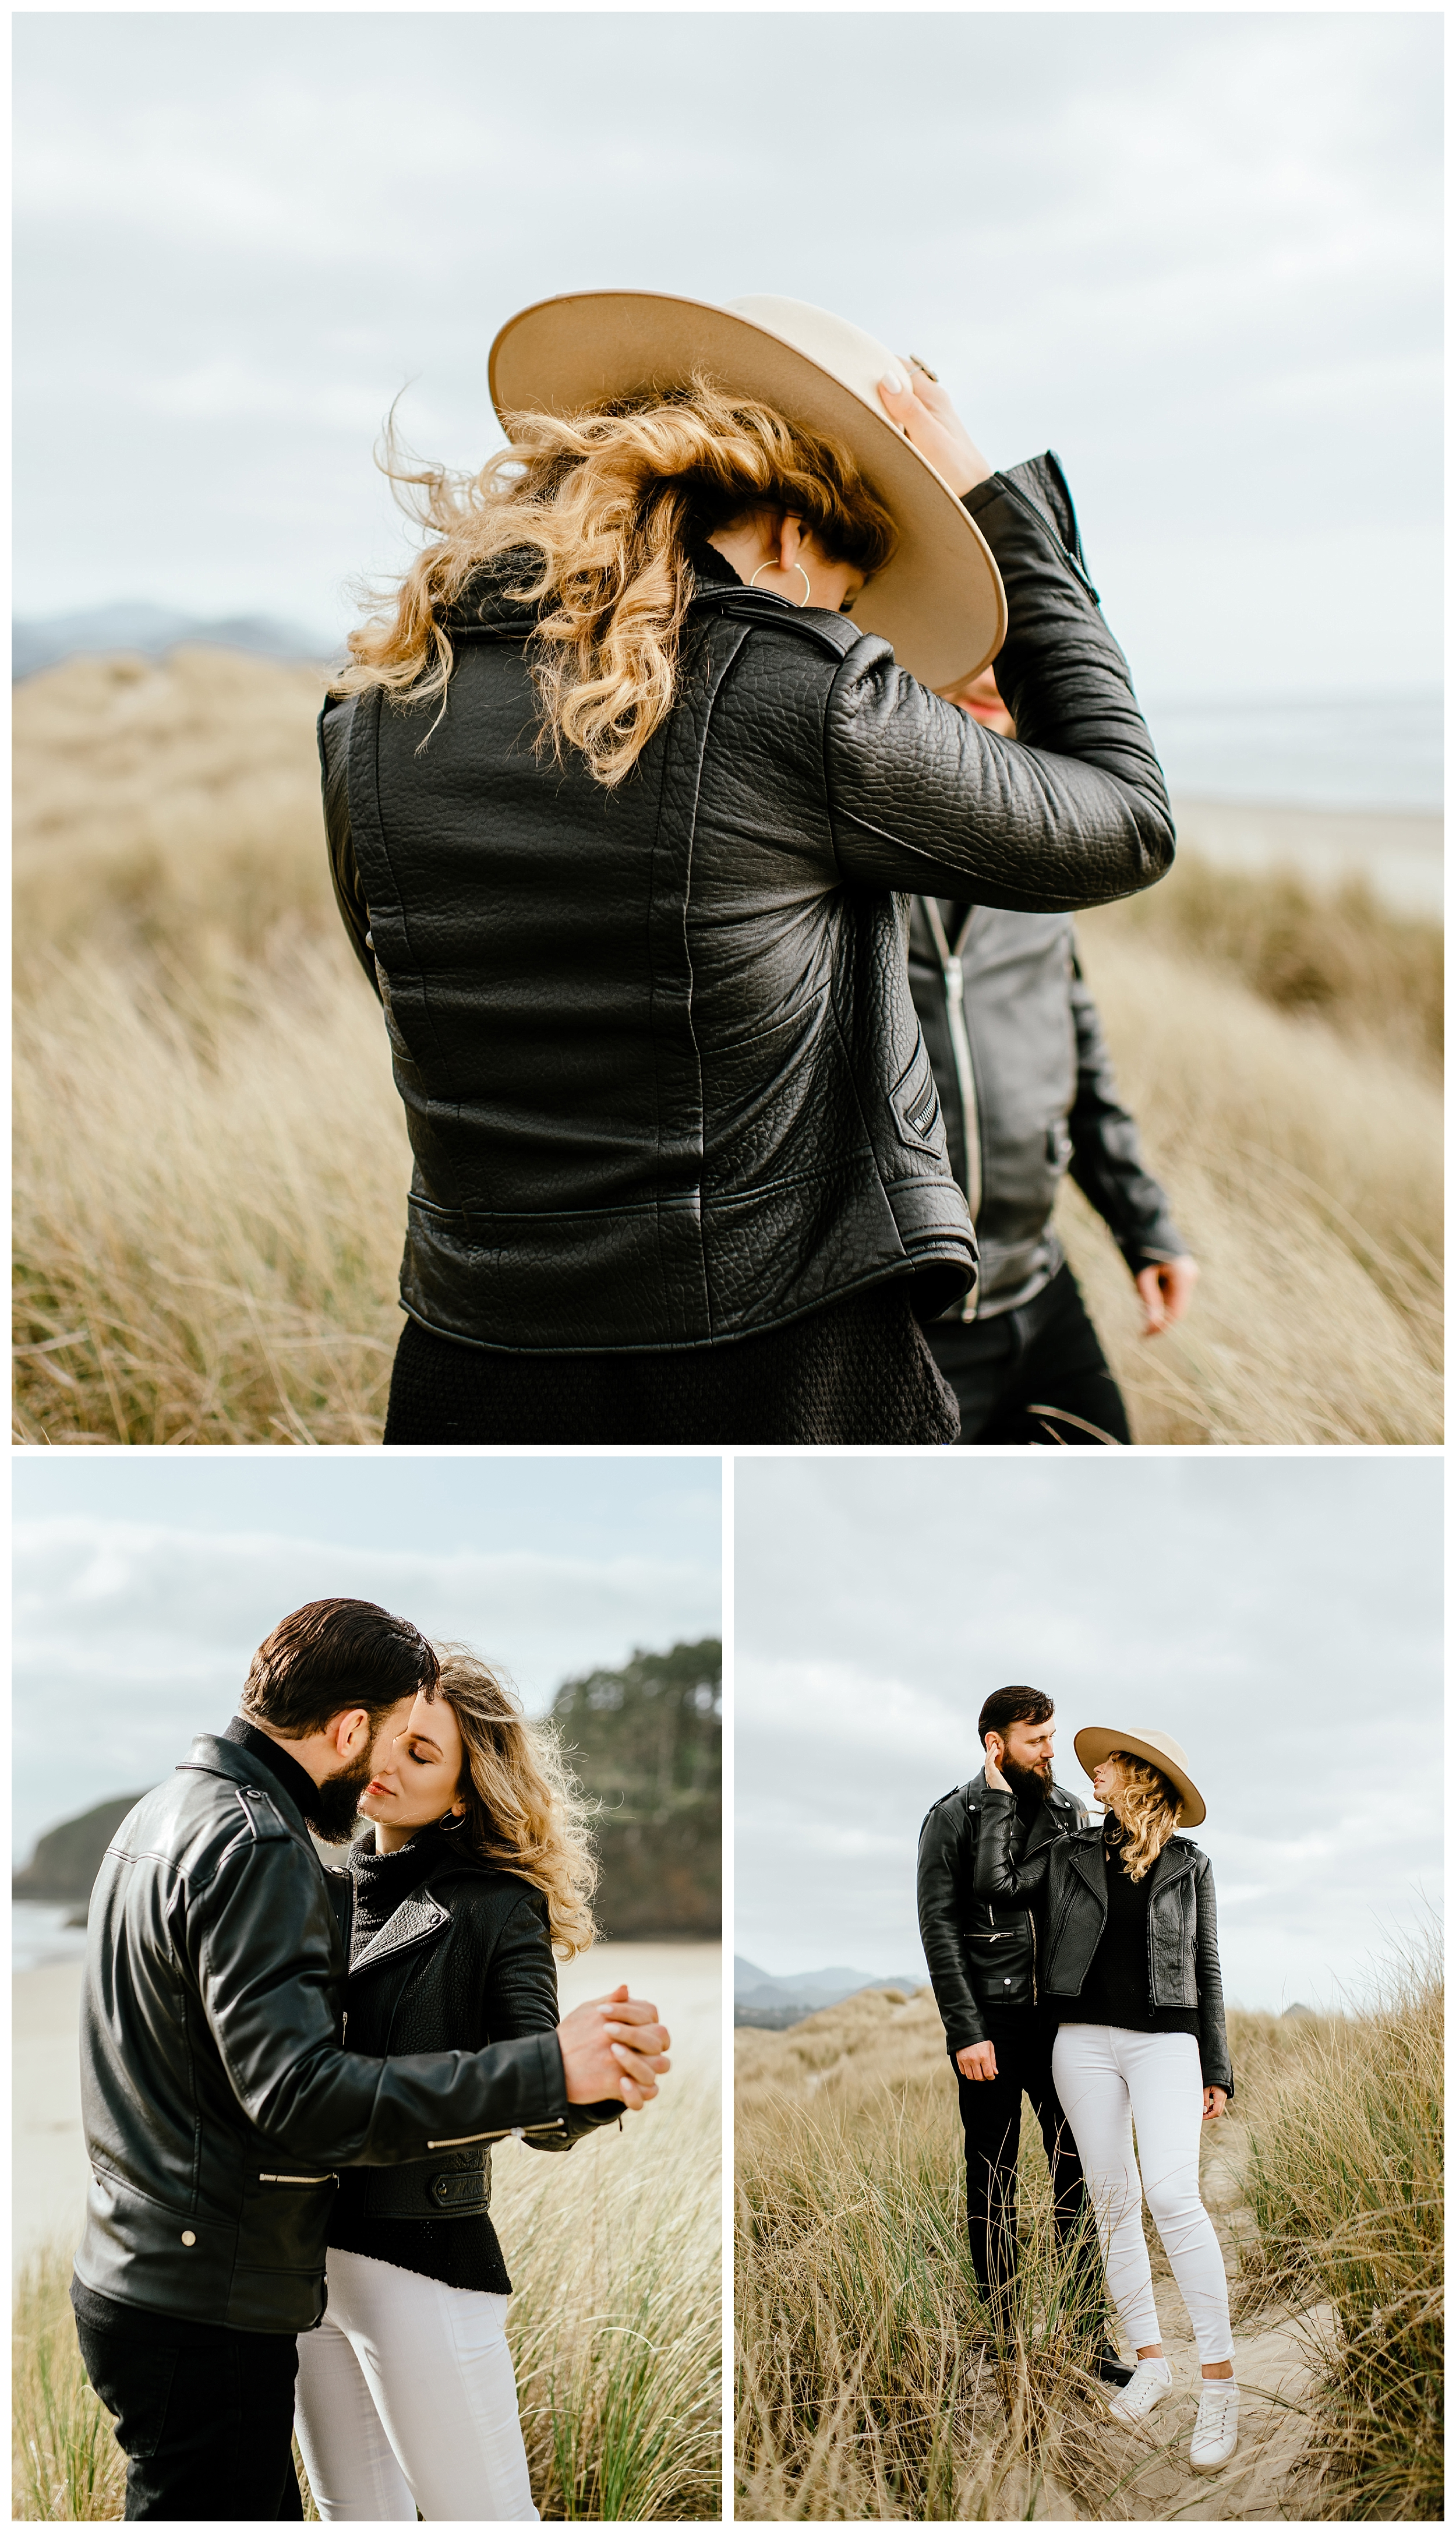 Cannon-Beach-Anniversary-Leather-Jacket-213.jpg